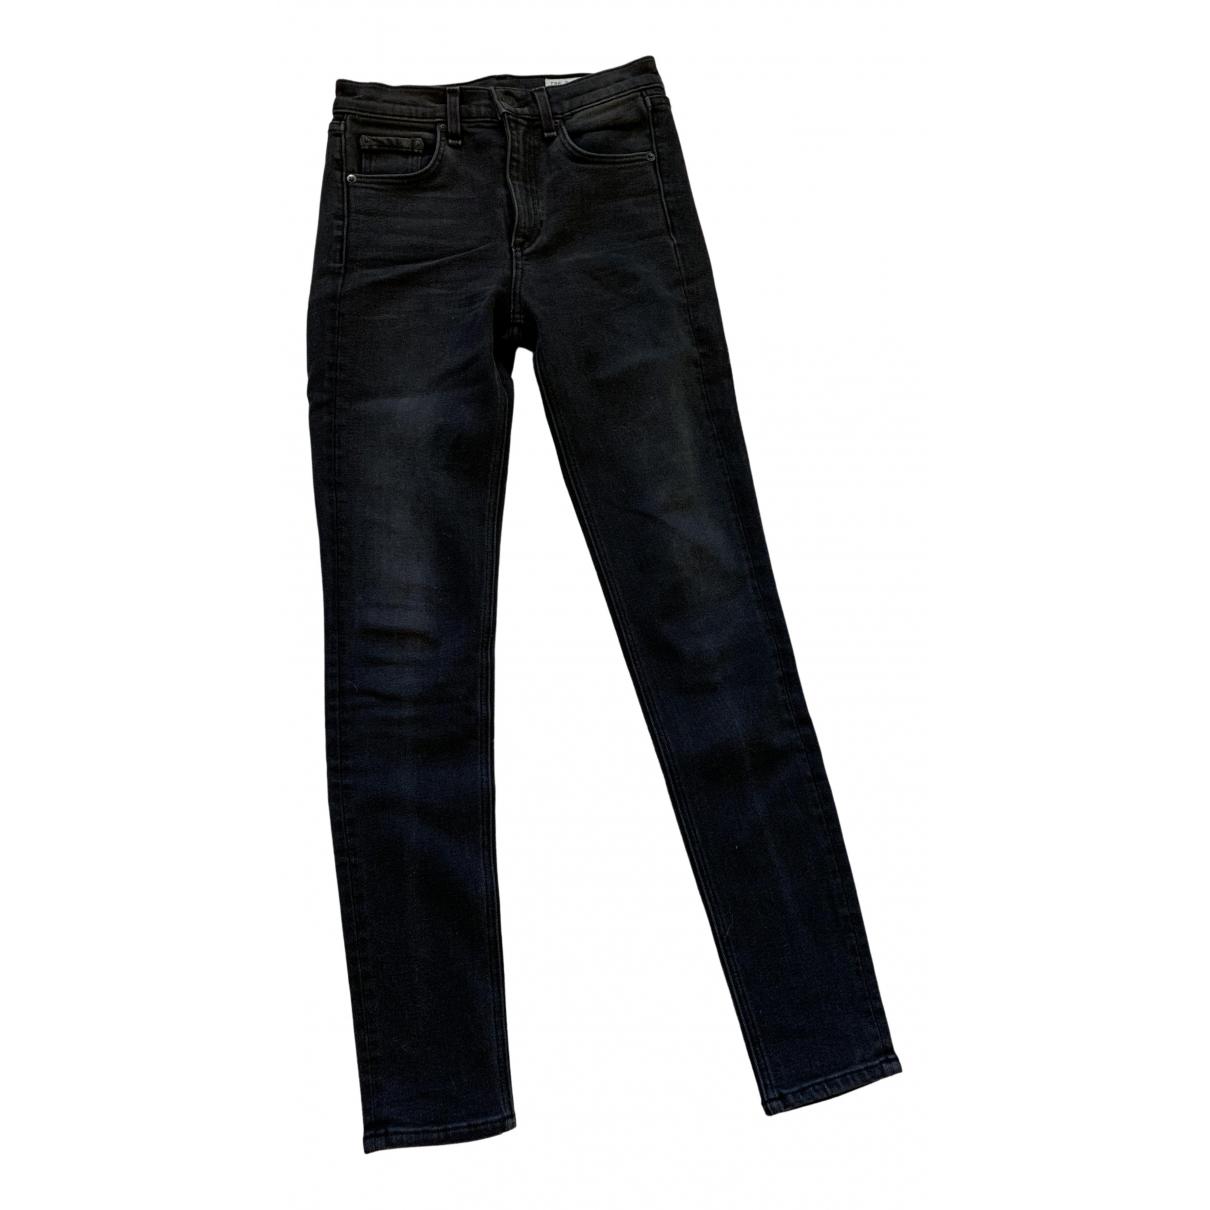 Rag & Bone - Jean   pour femme en denim - noir